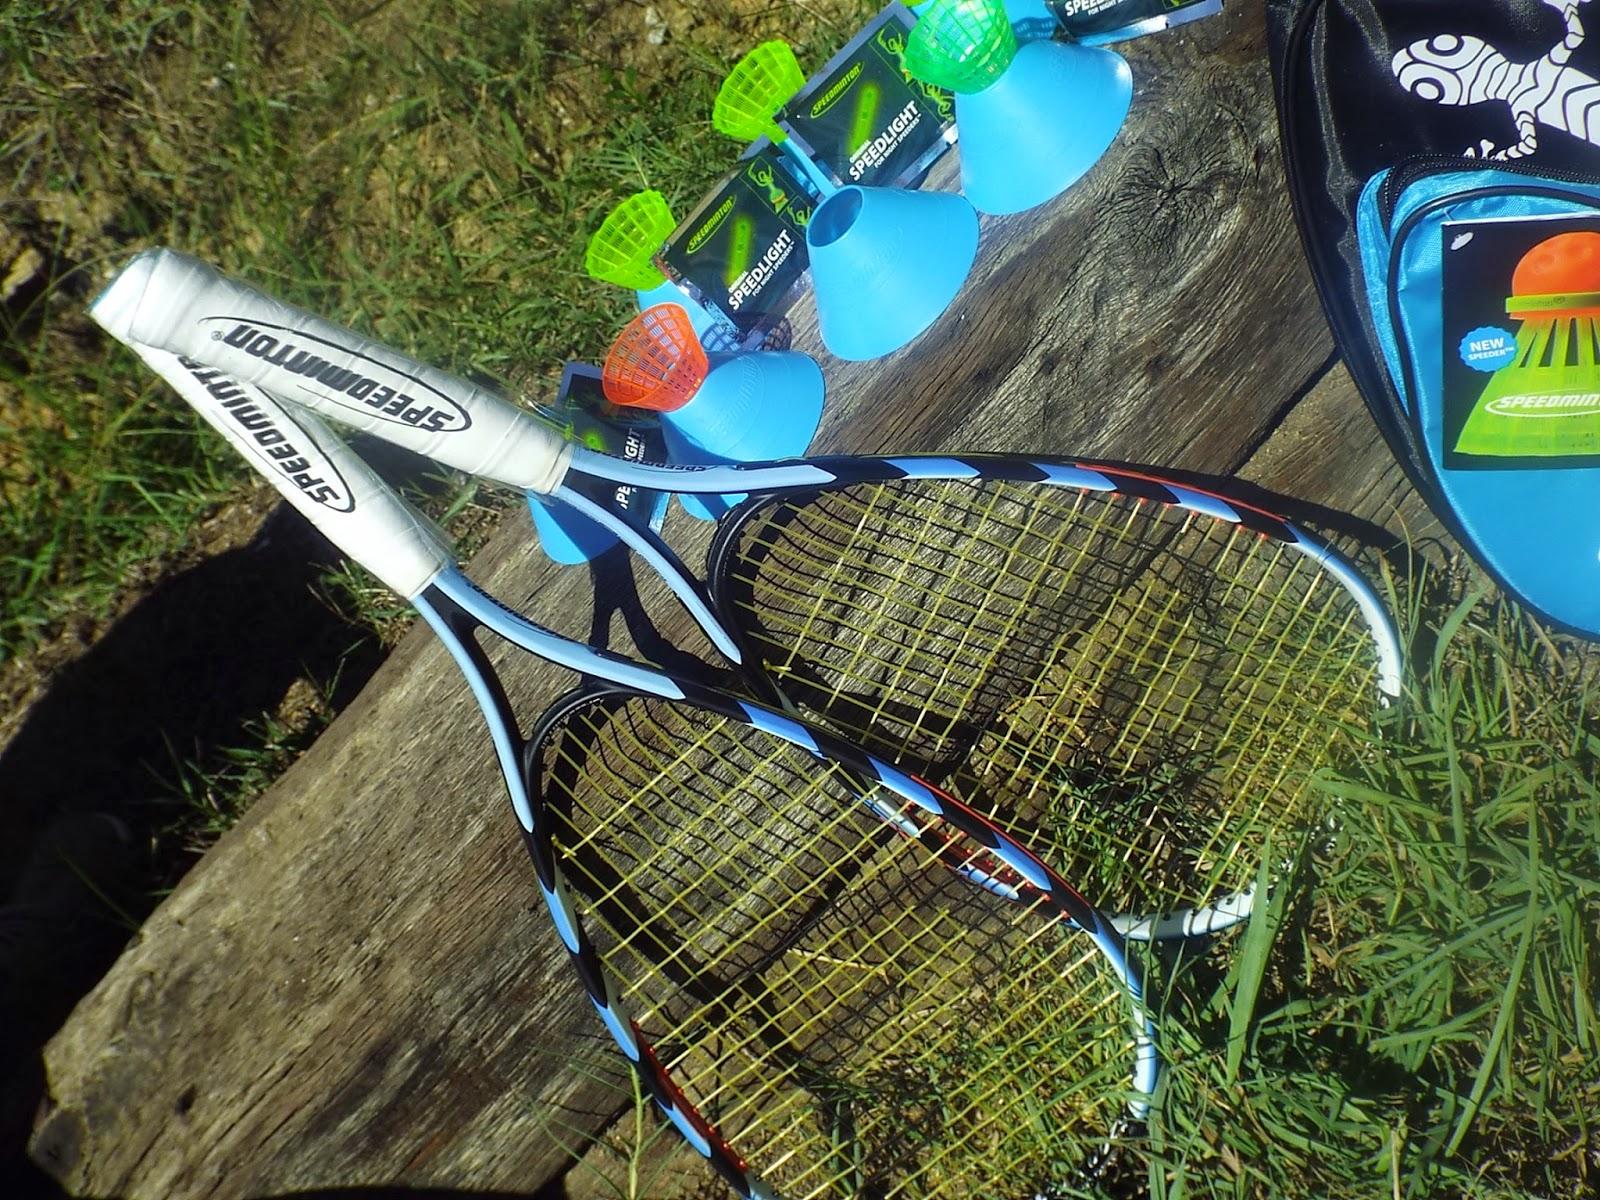 Speedminton S200 Set includes two rackets